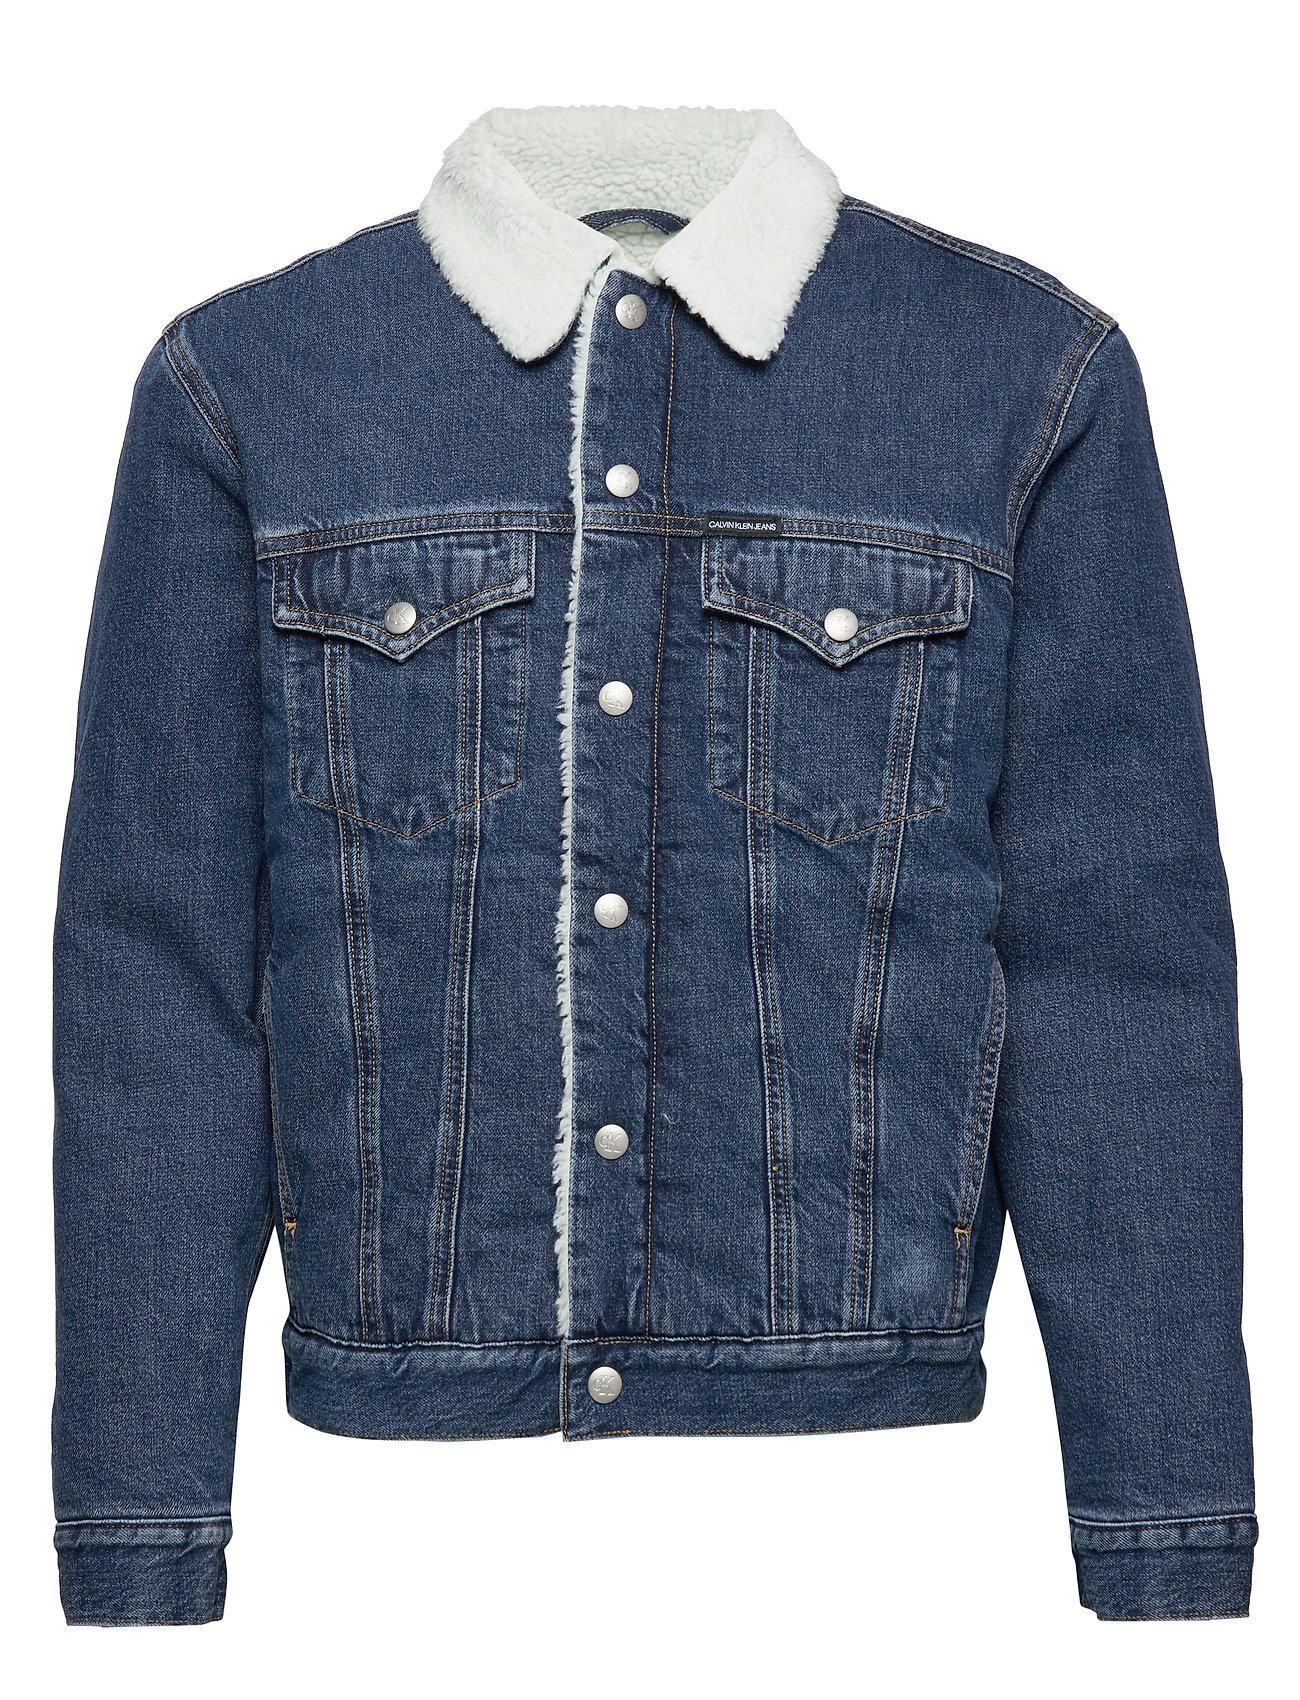 Calvin Klein Jeans SHERPA FOUNDATION DENIM JACKET - CA003 MID BLUE